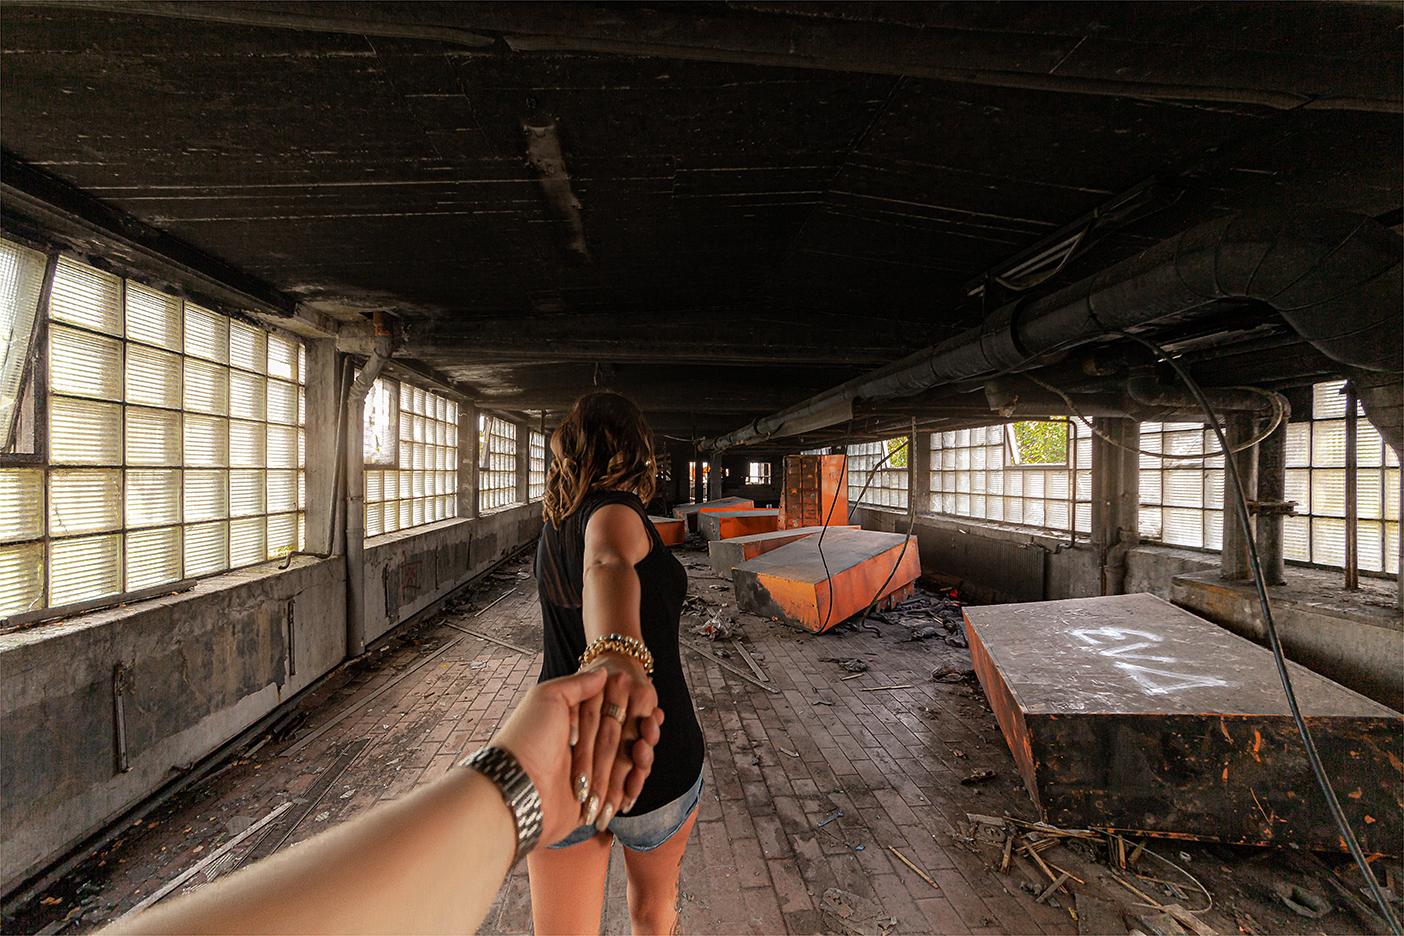 Follow me till the end